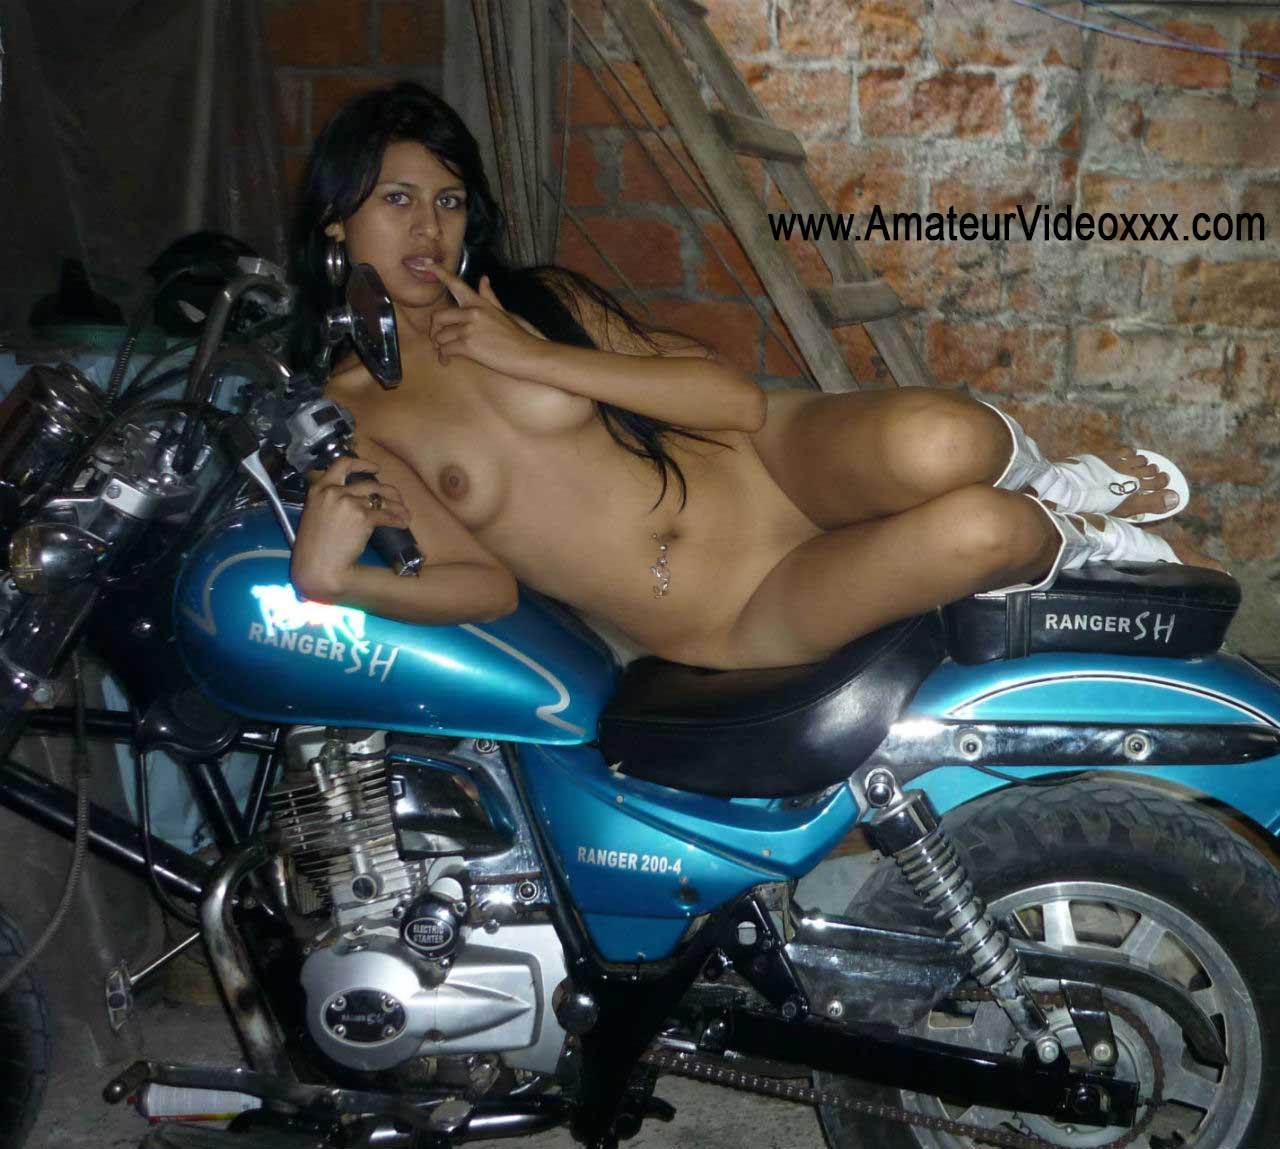 Chibolas Desnudas Joven de Barrio se Desnuda -minas-joven-xxx-desnuda-vagina-tetas-whatsapp-skype-porno-video-follando-culo (1)